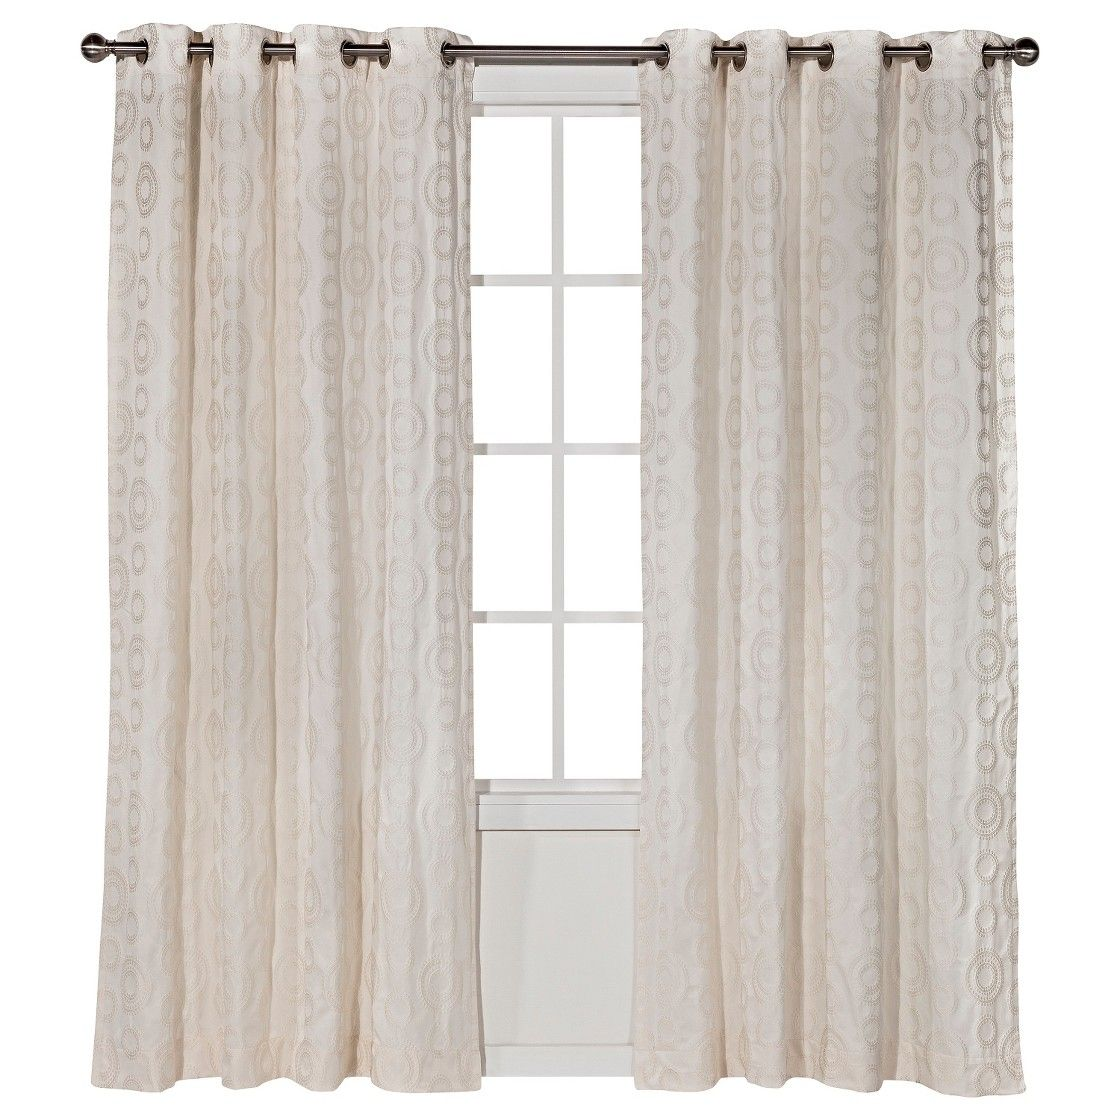 Threshold Dot Jacquard Curtain Panel   decor   Pinterest   Curtain ...